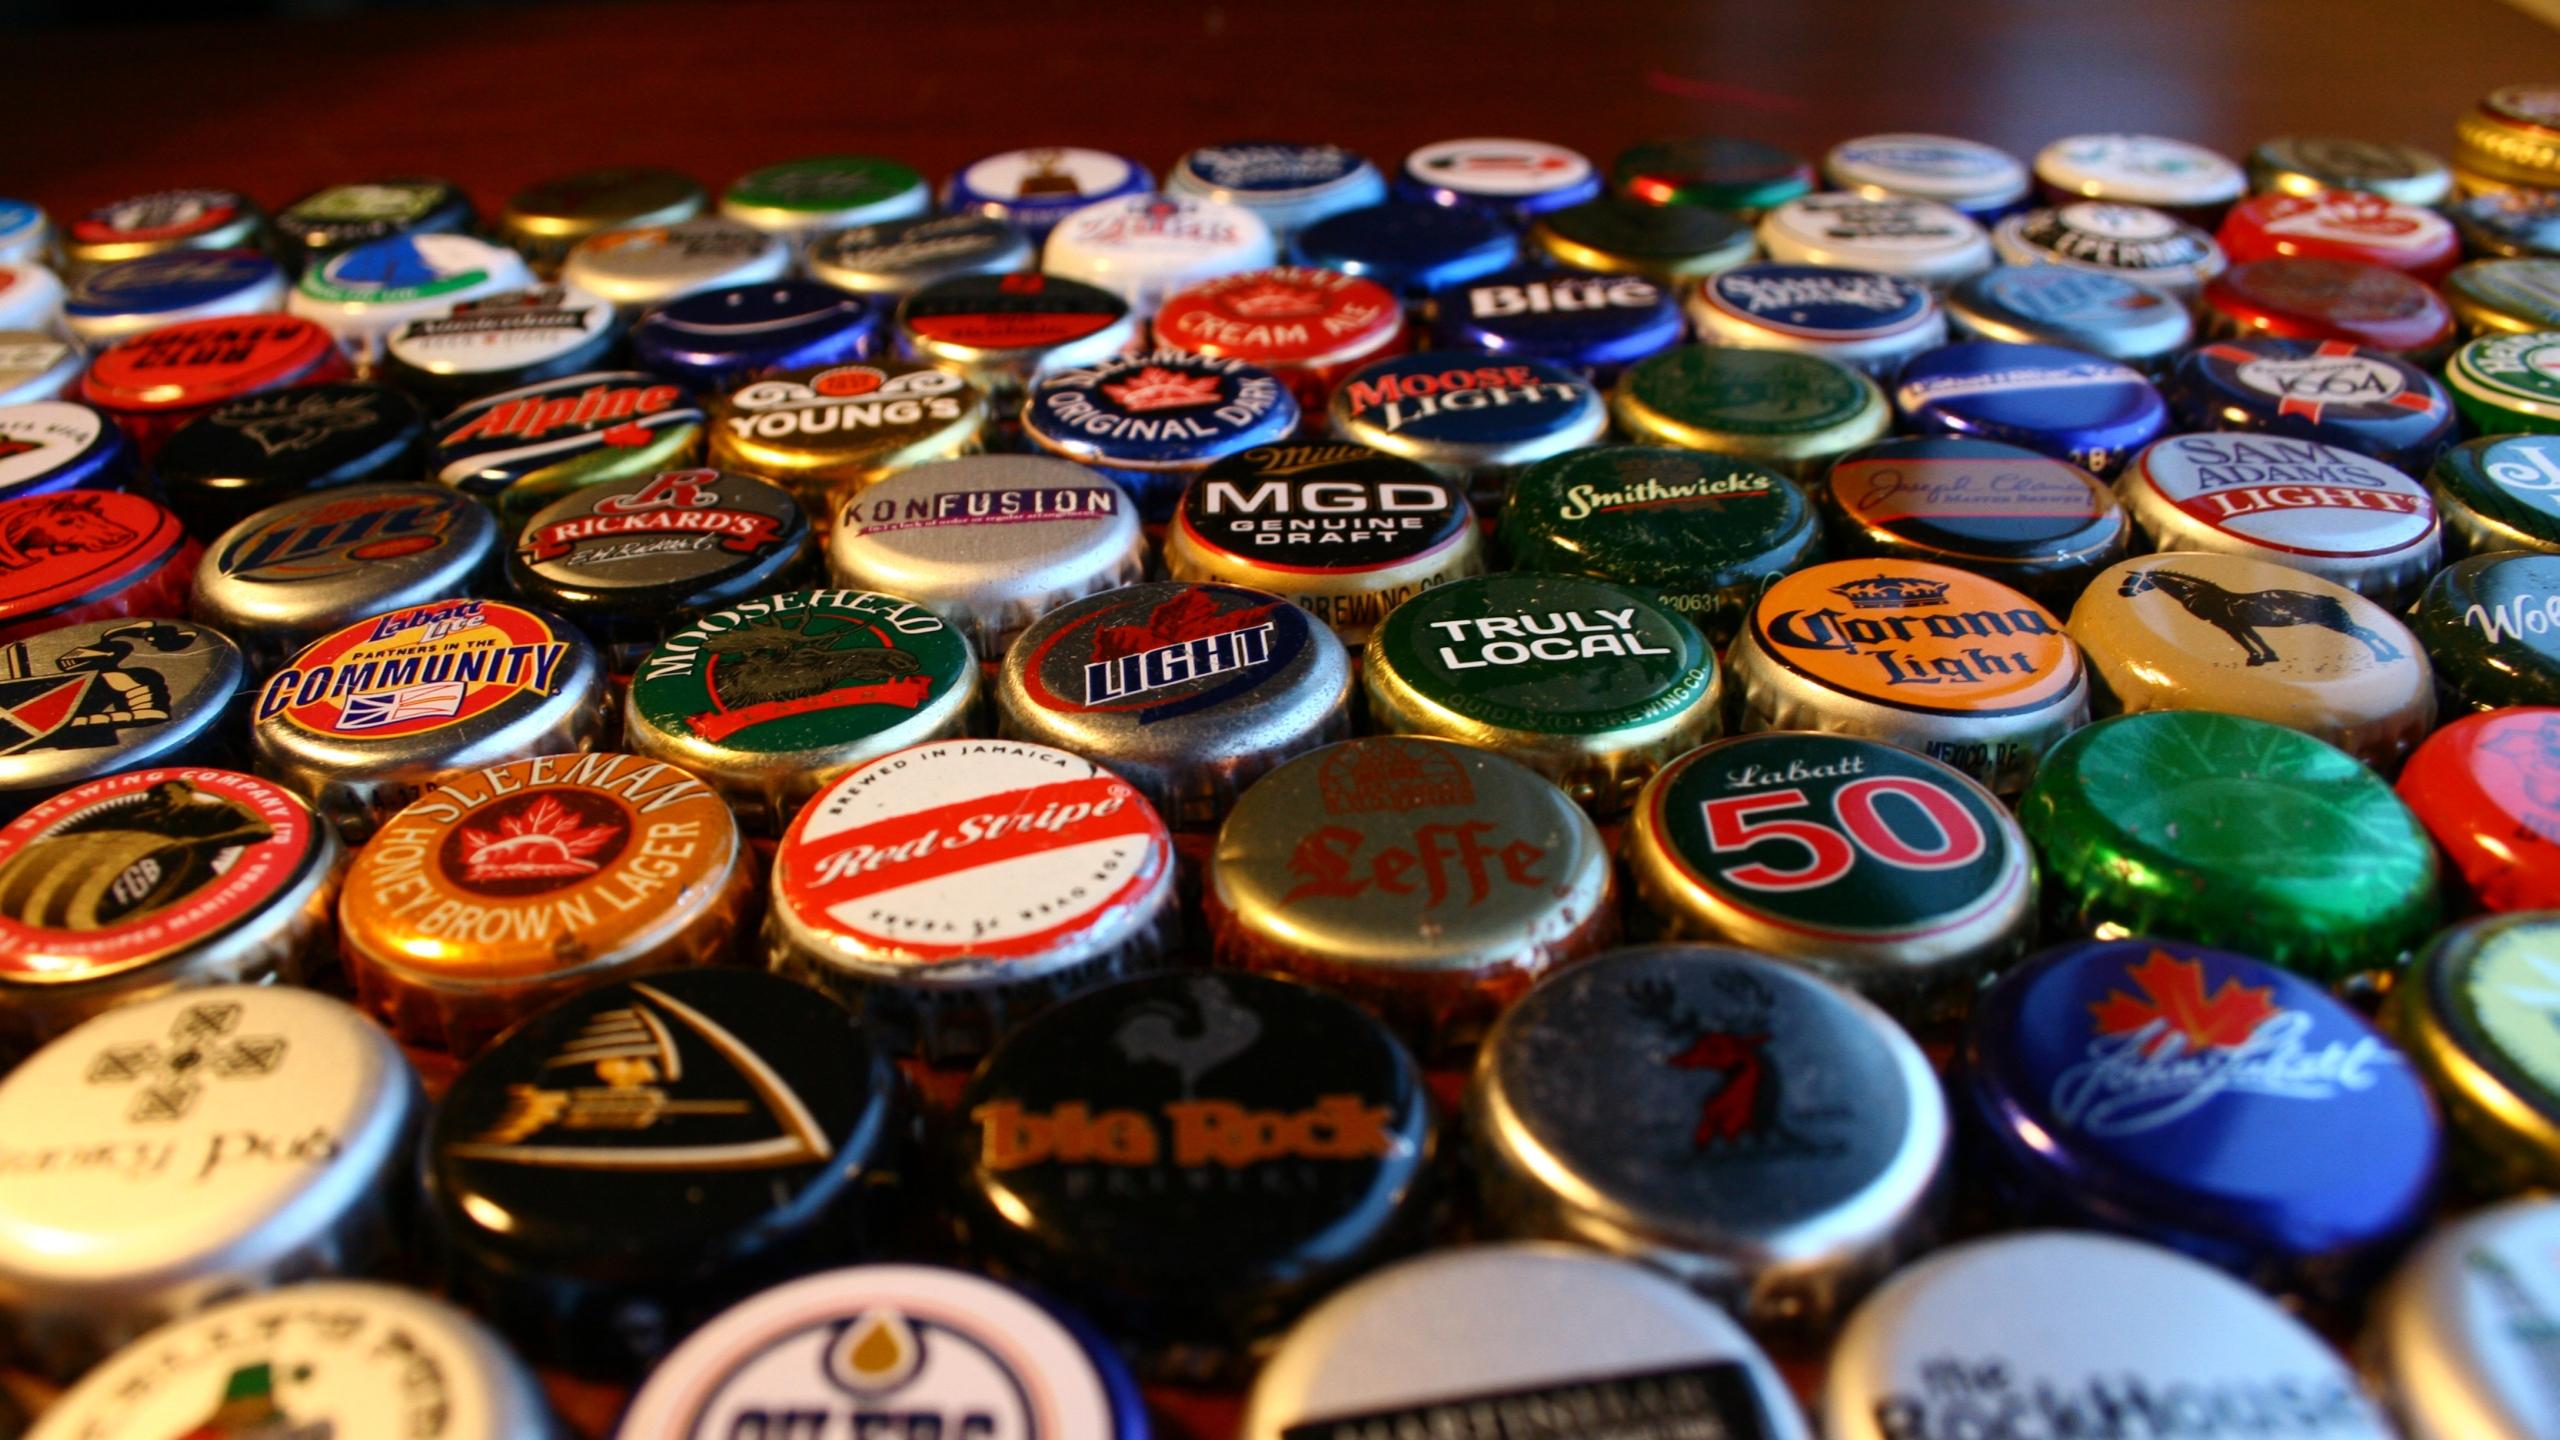 Images of Beer Bottle Caps | 2560x1440